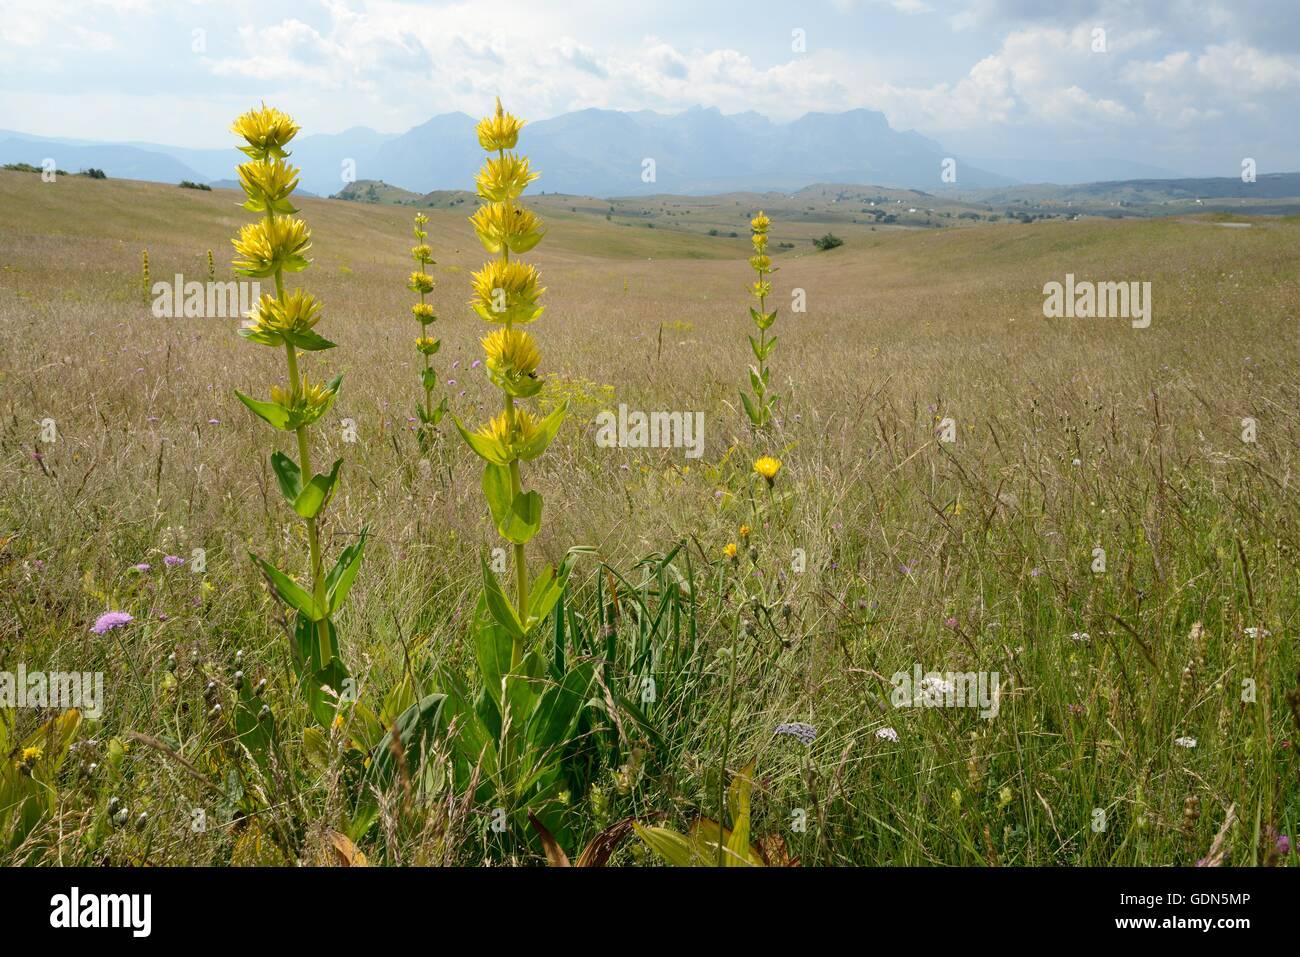 Great yellow gentian (Gentiana lutea ssp. symphyandra) flowering spikes on Mount Piva plateau, near Trsa, Montenegro. - Stock Image